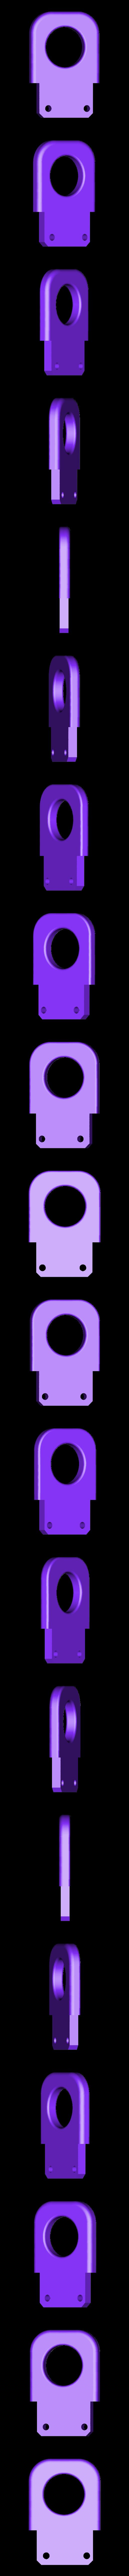 03-X-Carriage-Rnd-Prox-Bracket-v2.stl Télécharger fichier STL gratuit Tevo Tarantula Direct E3D Titan X-Carriage • Design pour impression 3D, theFPVgeek